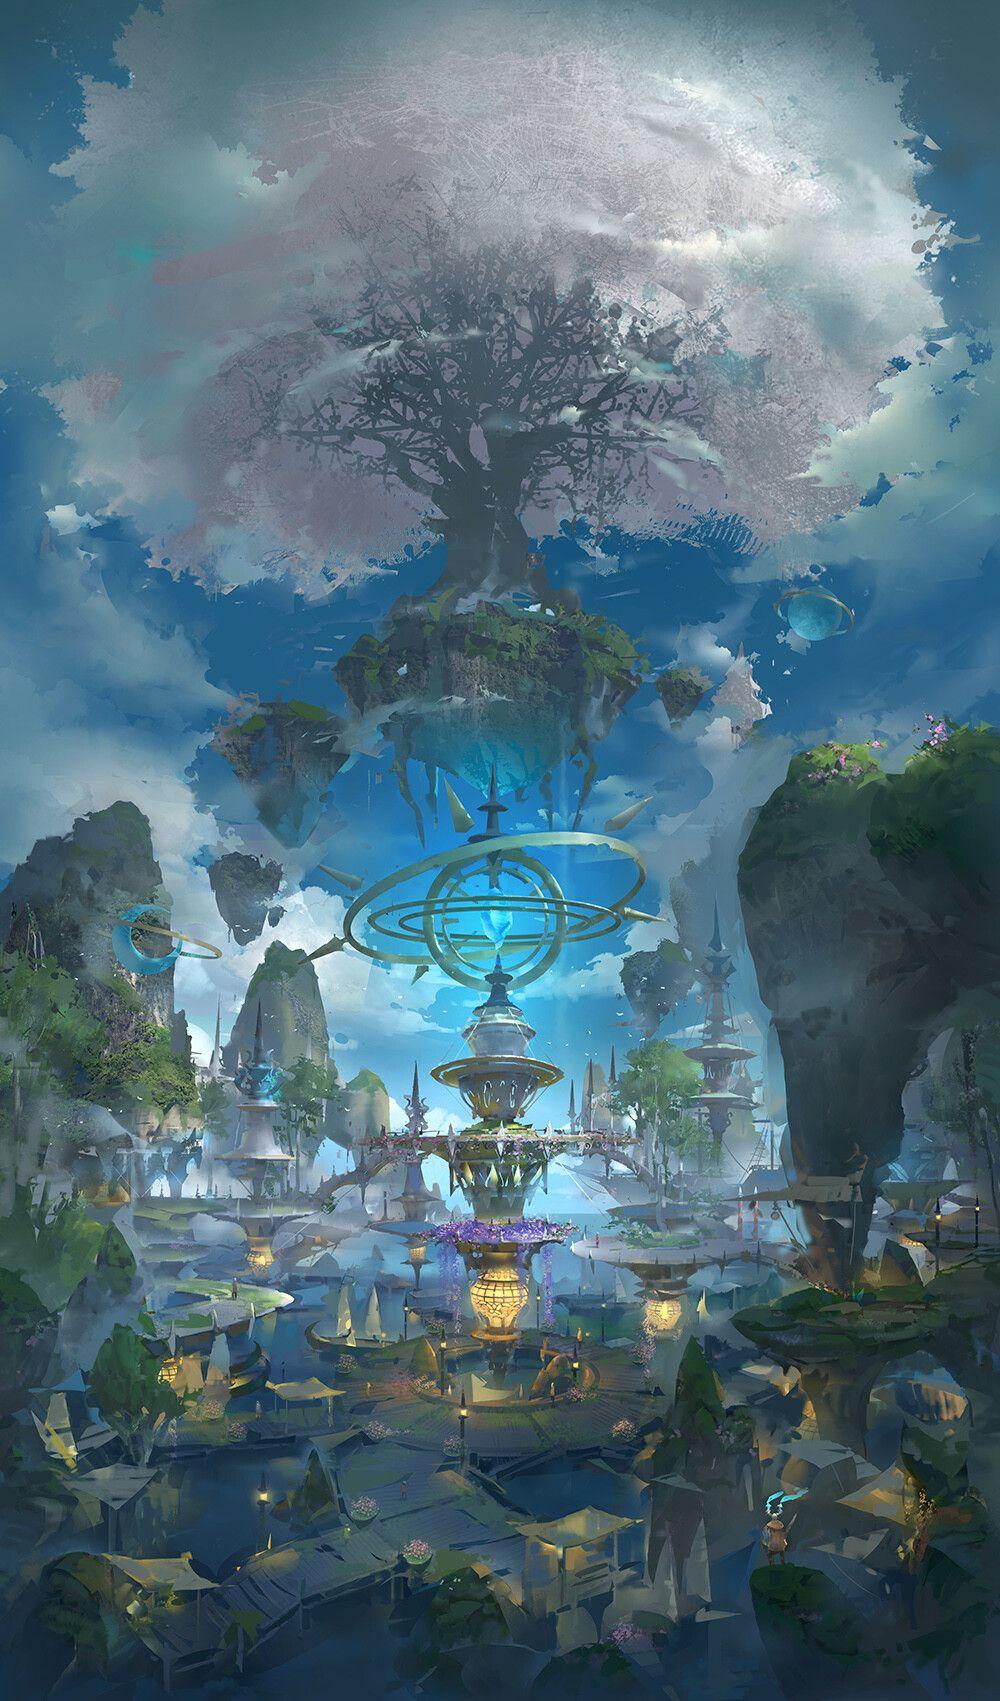 3 LY #art #арт #остров #море #фэнтези #дерево #башня